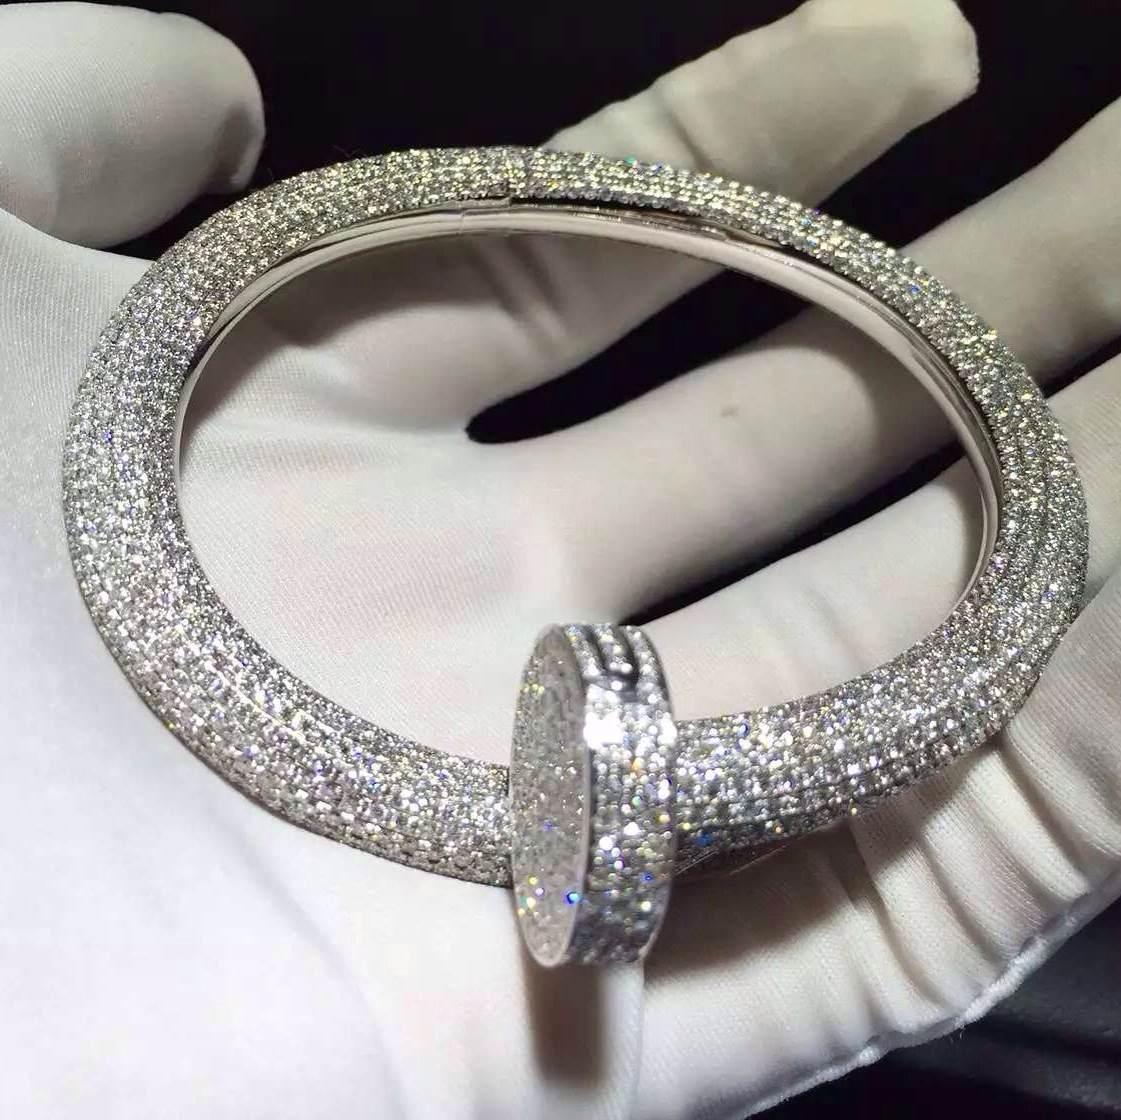 18K white gold Cartier Juste un Clou Nail Bracelet Paved 1752 Diamonds